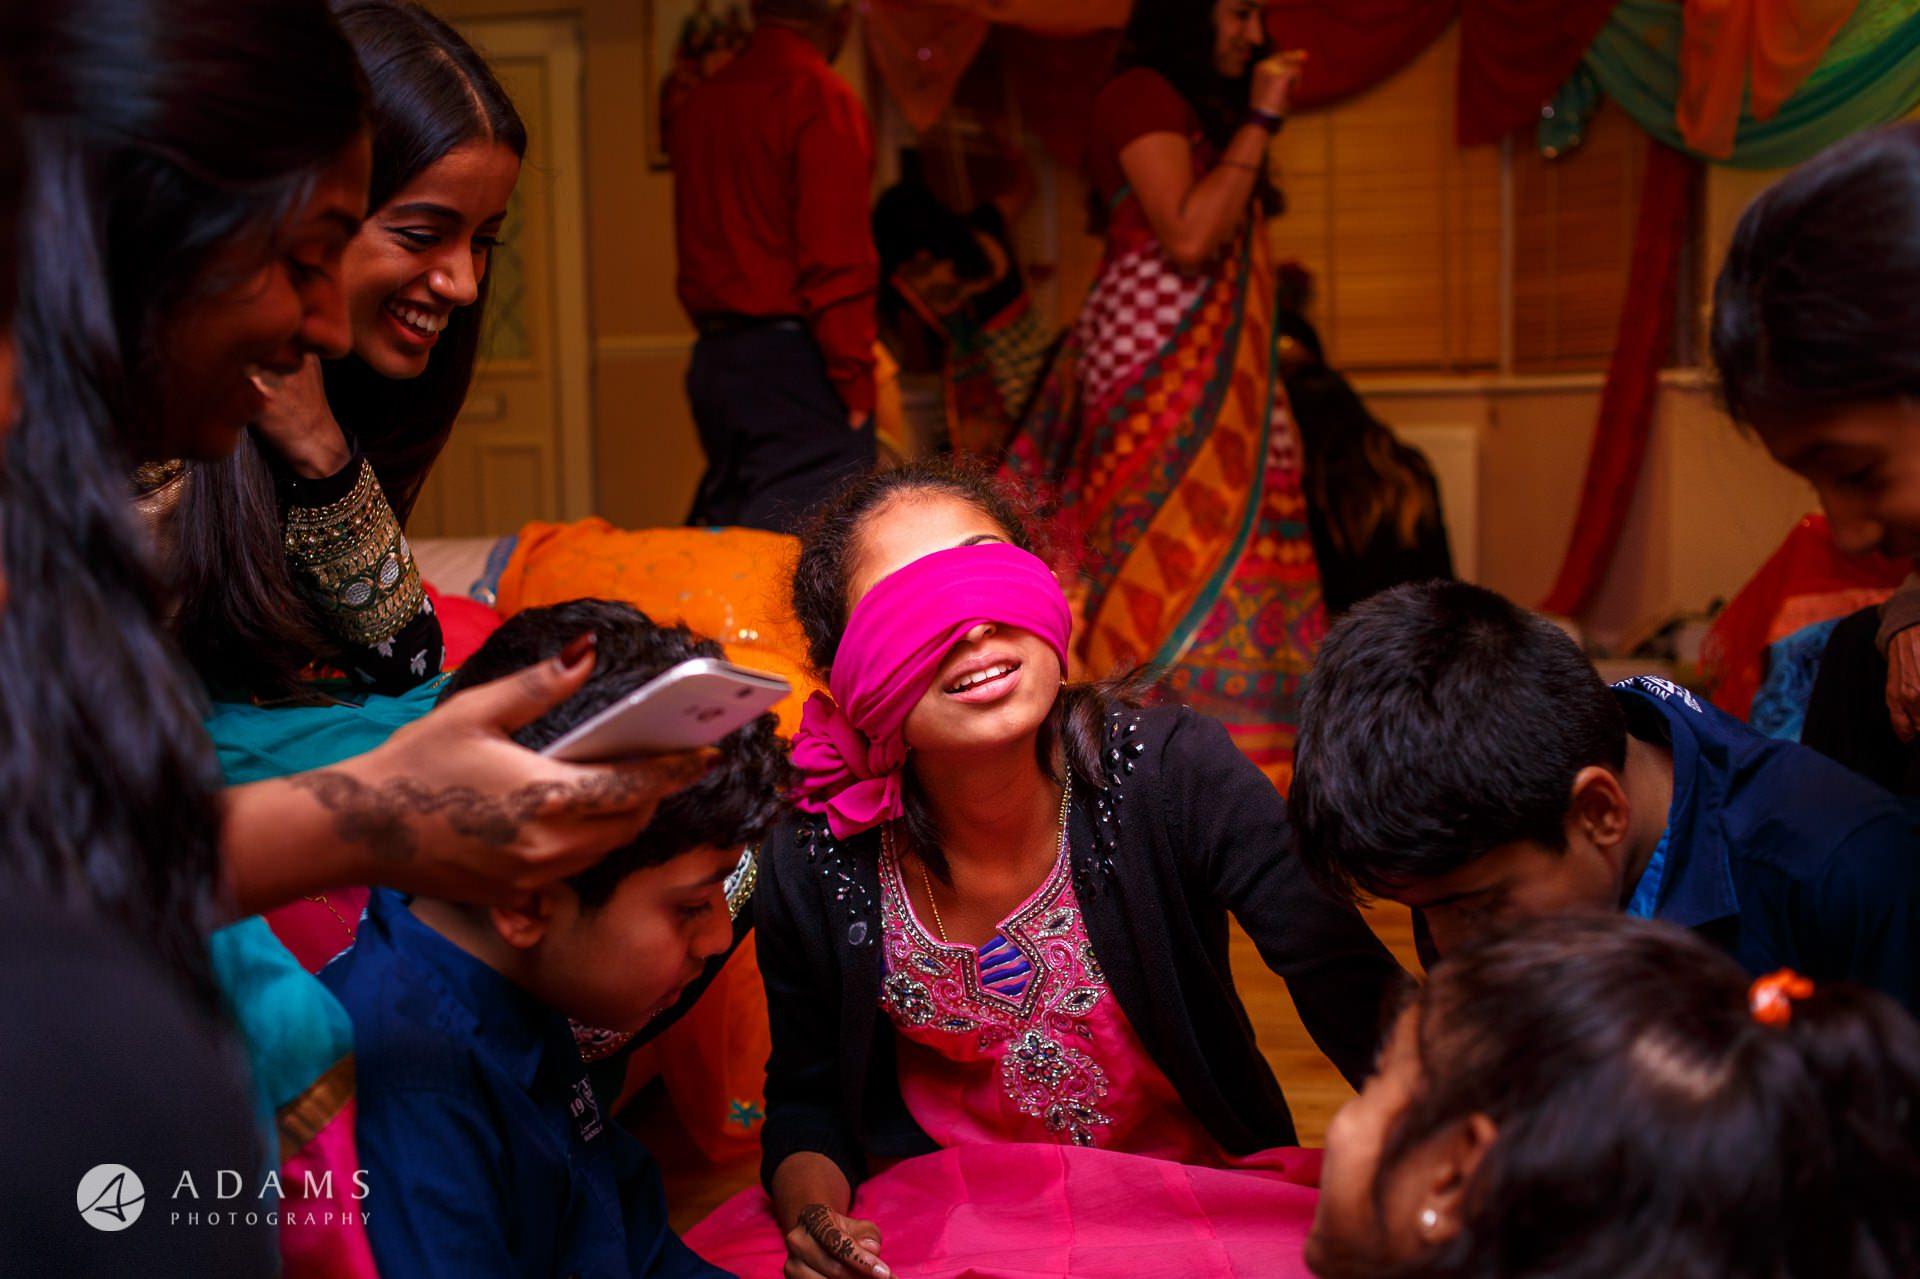 Mehndi Night Ceremony : Tamil mehndi night gold melting ceremony